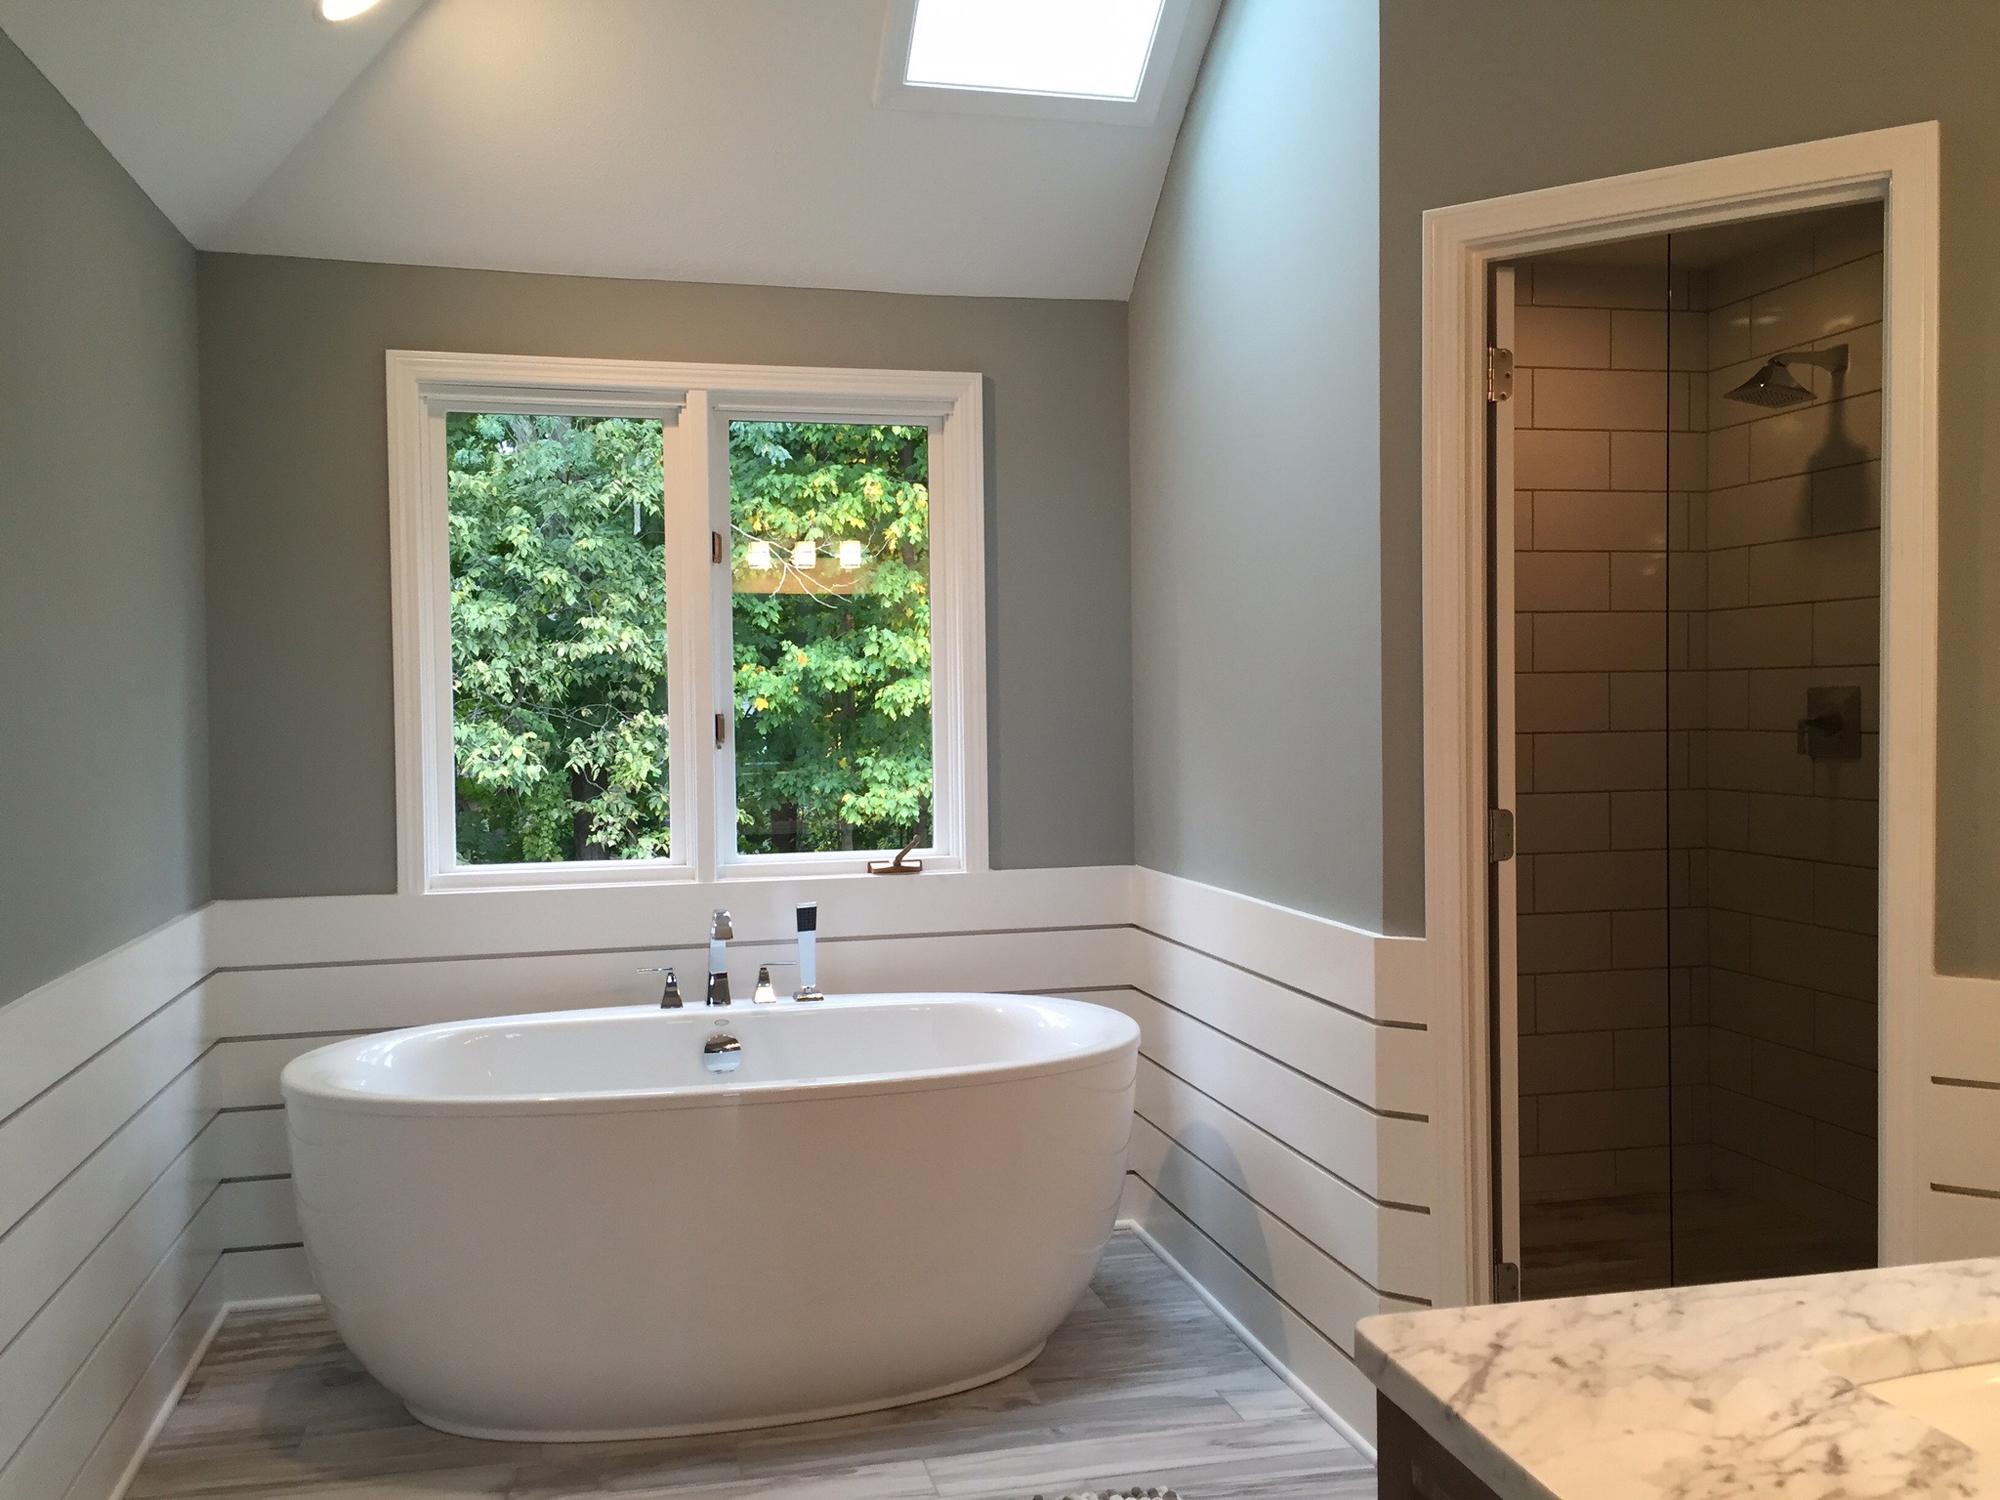 column luxury tubs add beauty style to bathroom